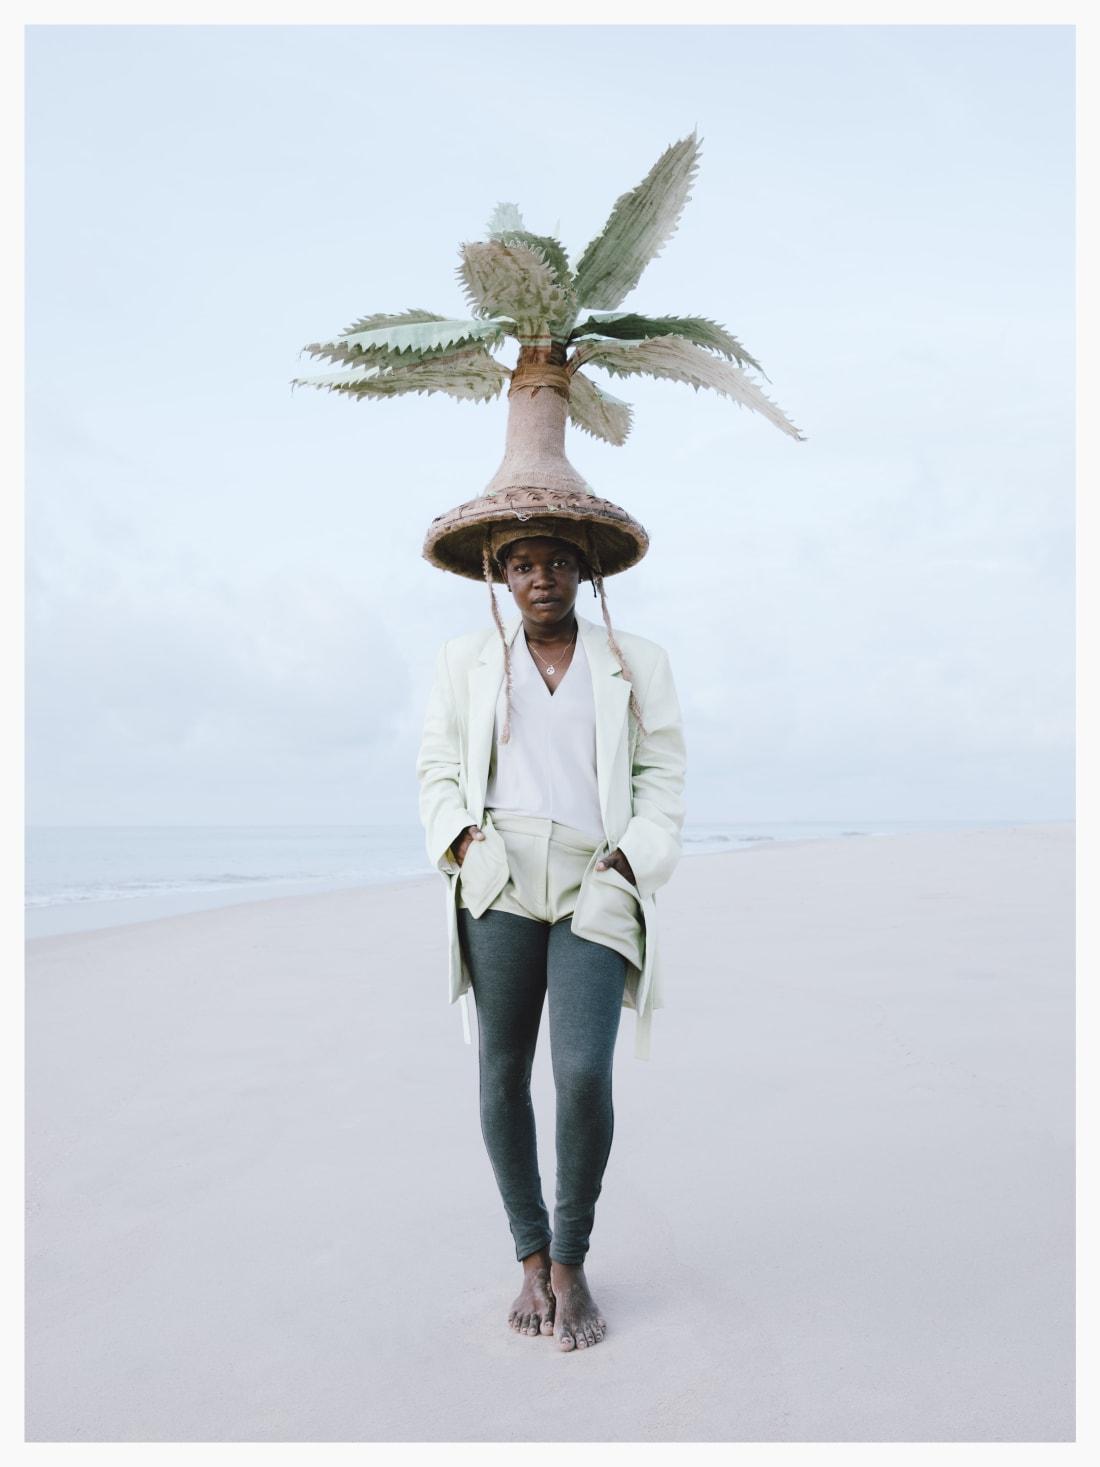 04 Africa Avant Garde Kristin-Lee Moolman photos RESTRICTED